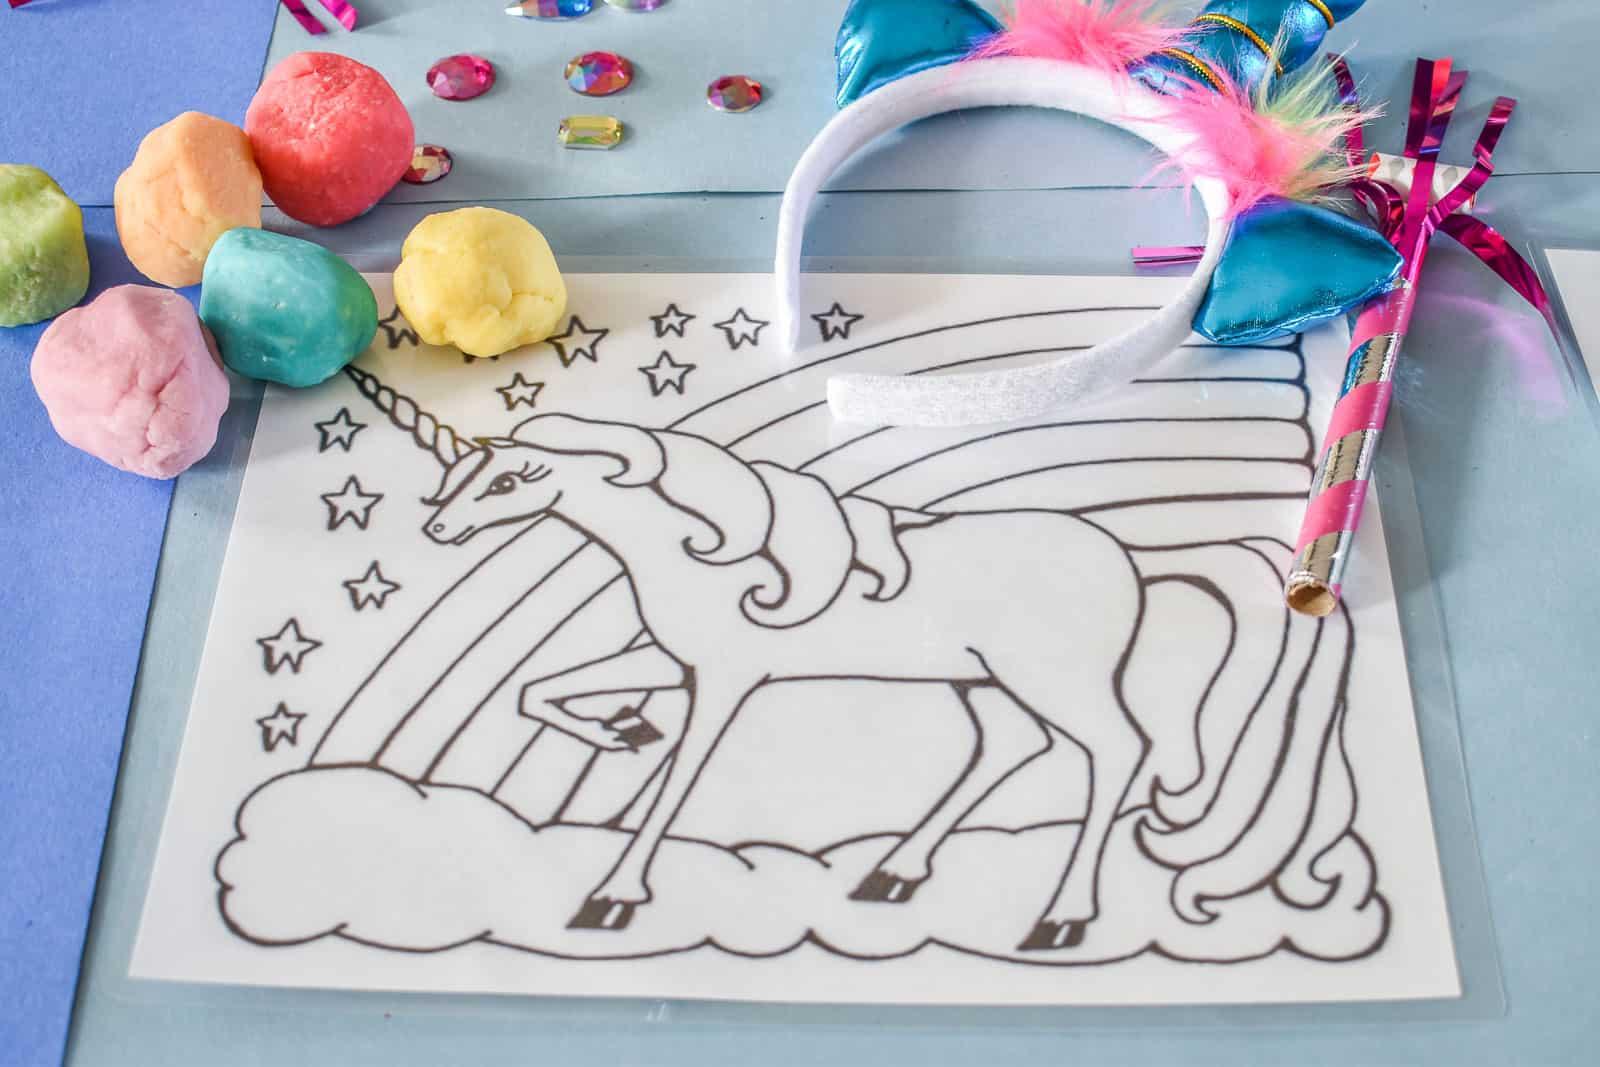 rainbow playdough and unicorn play dough mat